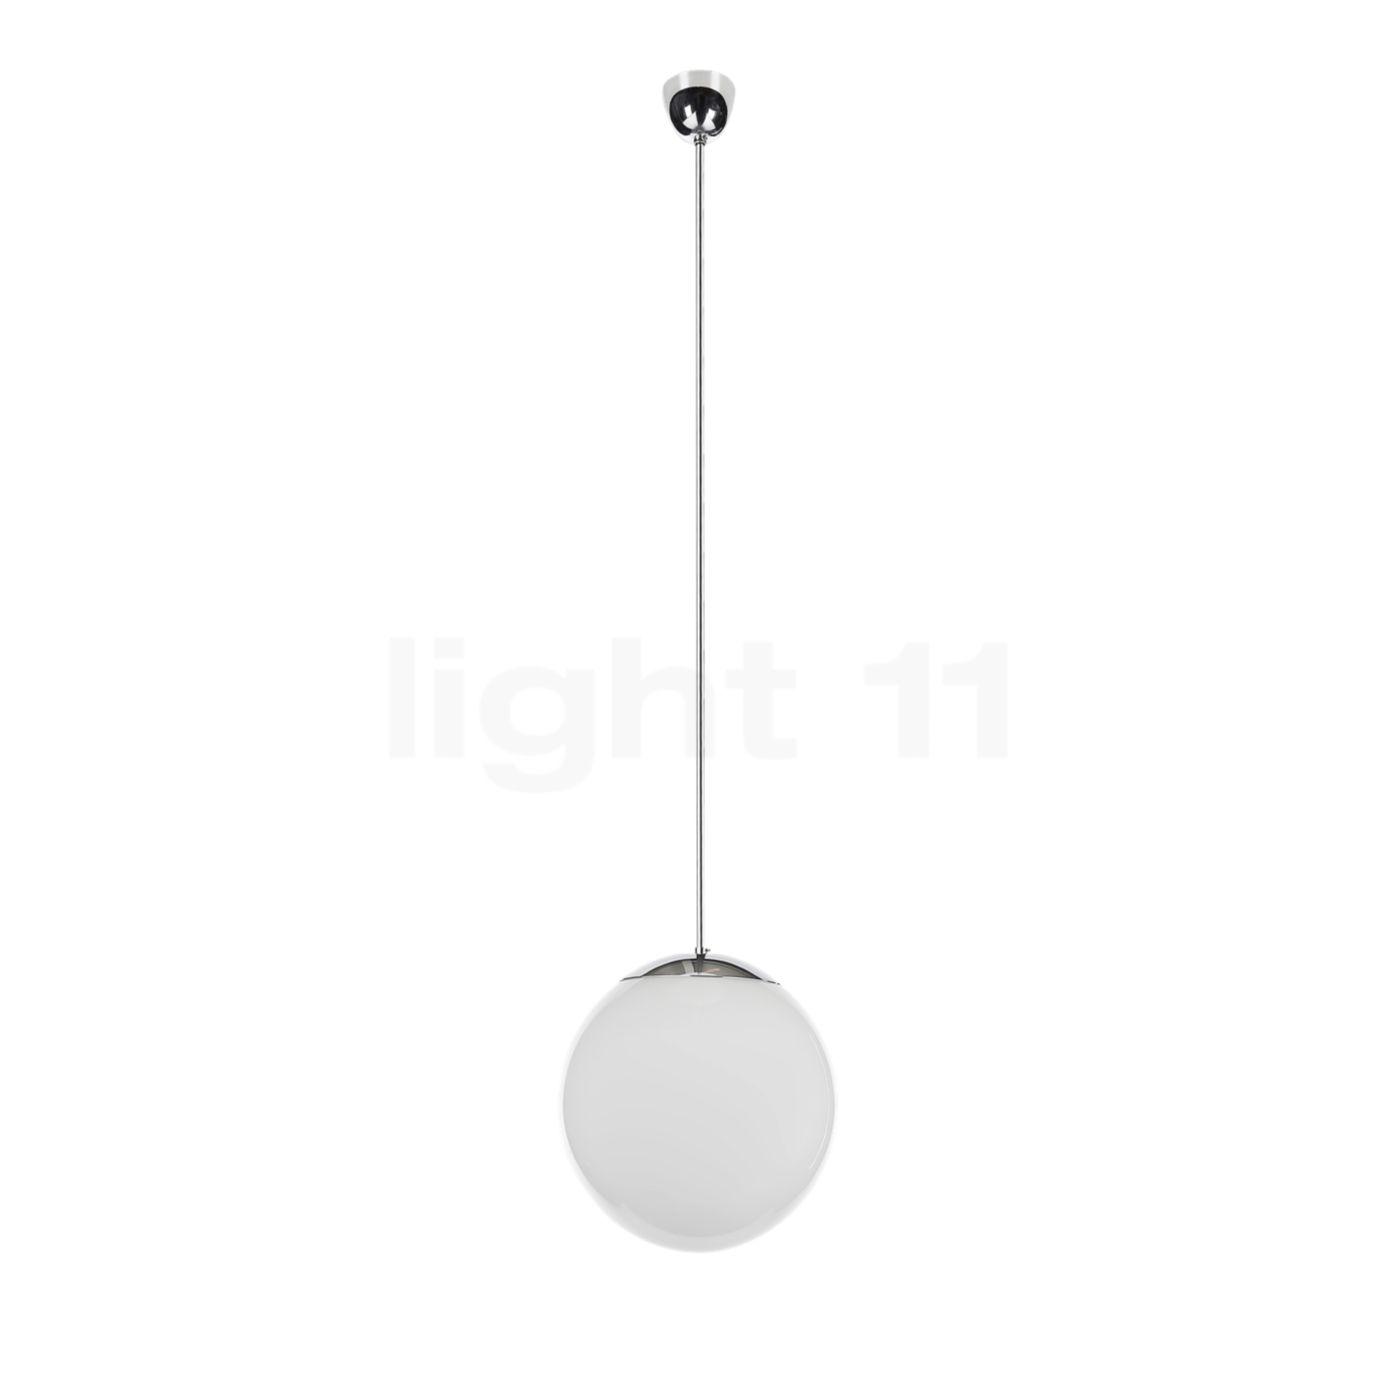 Tecnolumen HL 99 Pendelleuchte, Chrom, ø30 cm HL 99 / 300 Chr